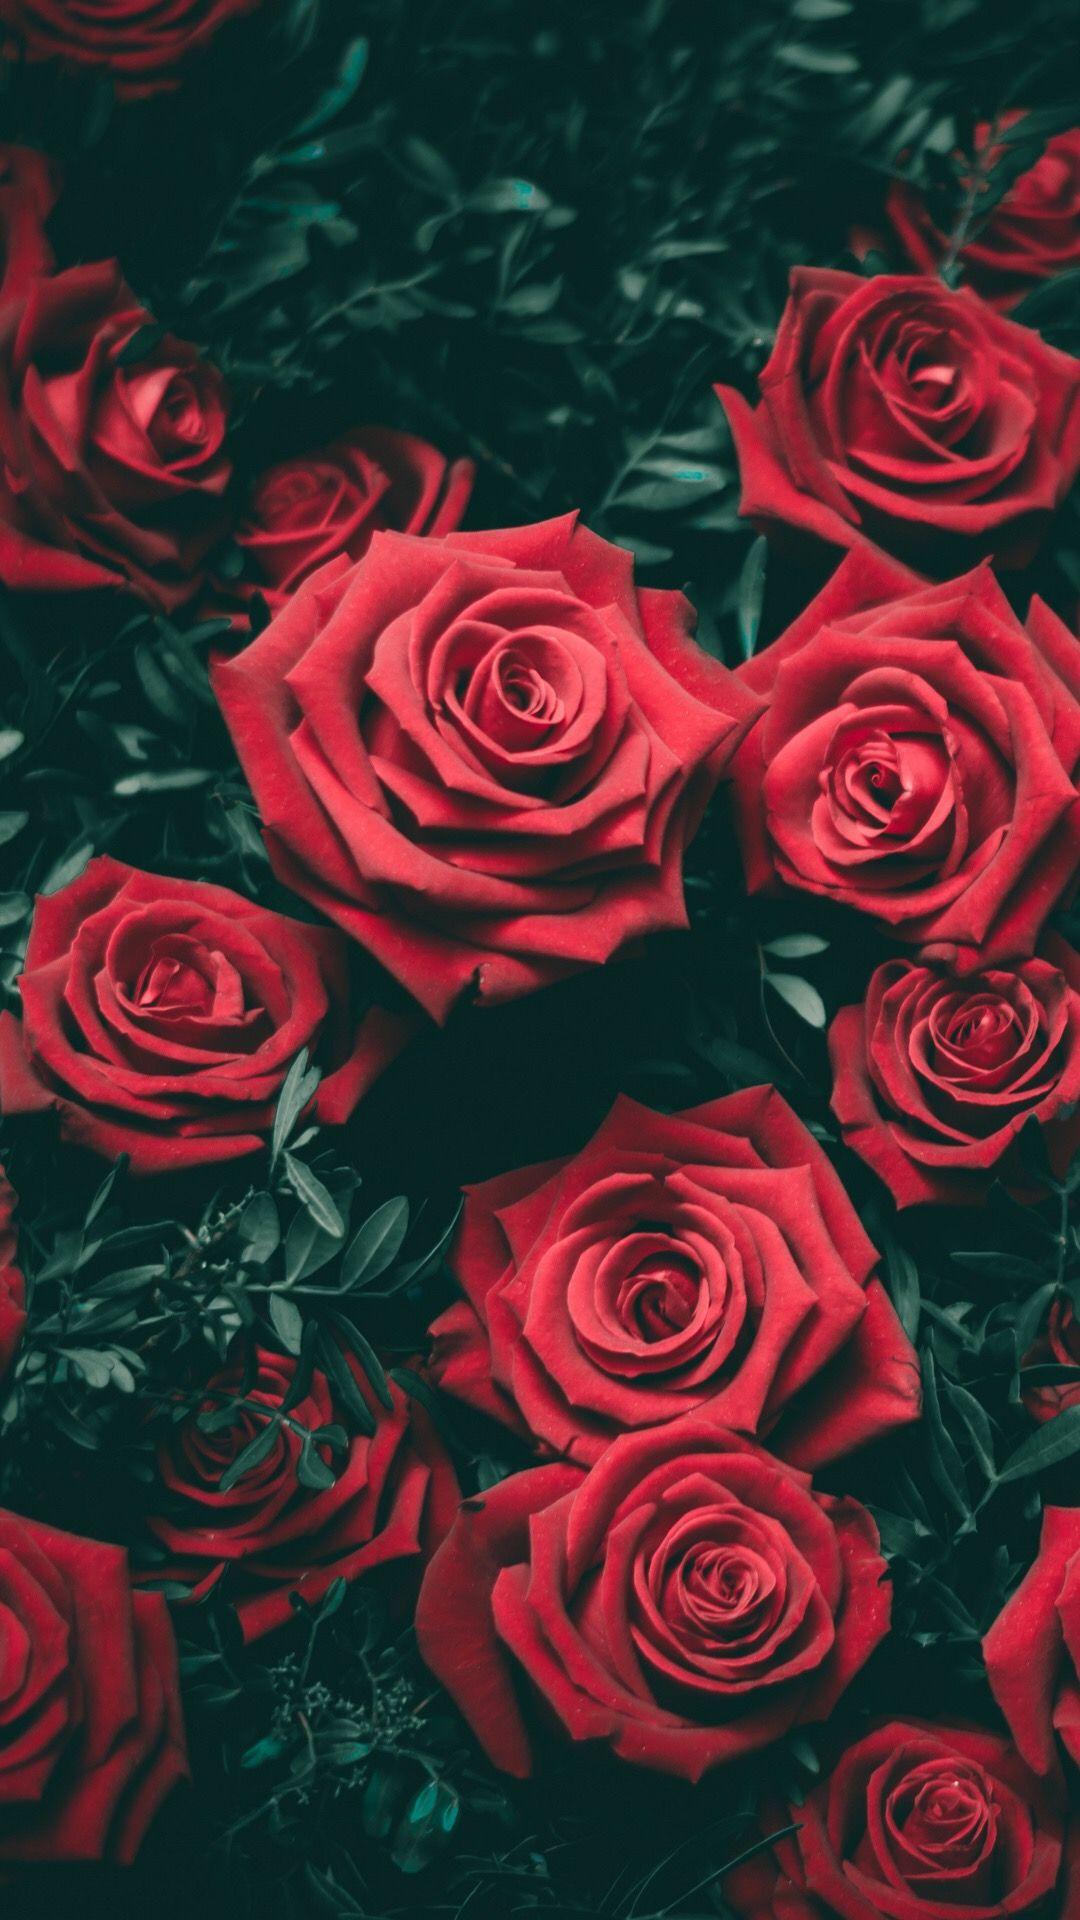 Red garden roses. | | Flowers | | Rose wallpaper, Flowers, Beautiful roses